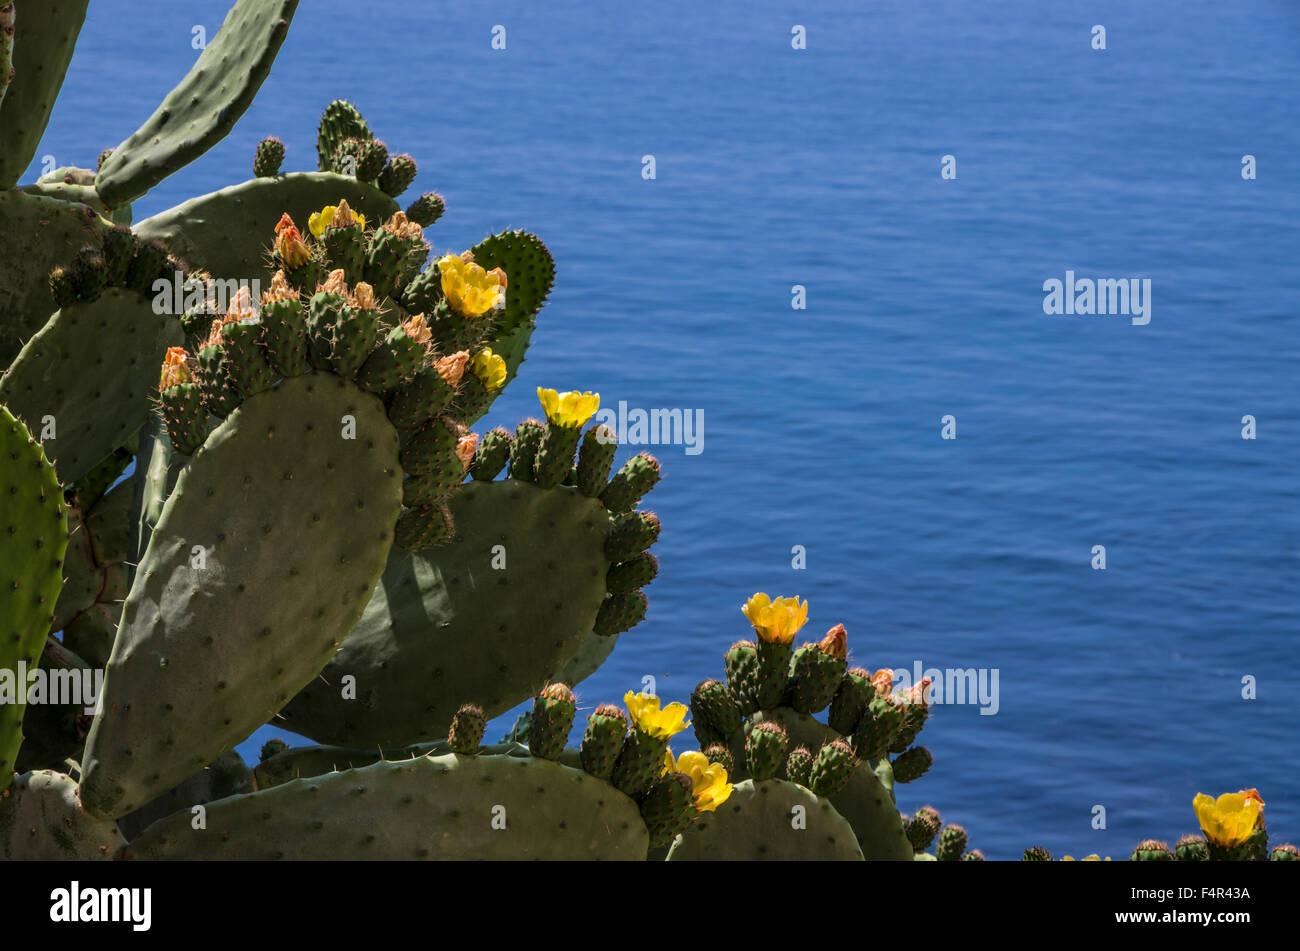 Opuntia ficus-indica looking to the tirrenian sea - Stock Image